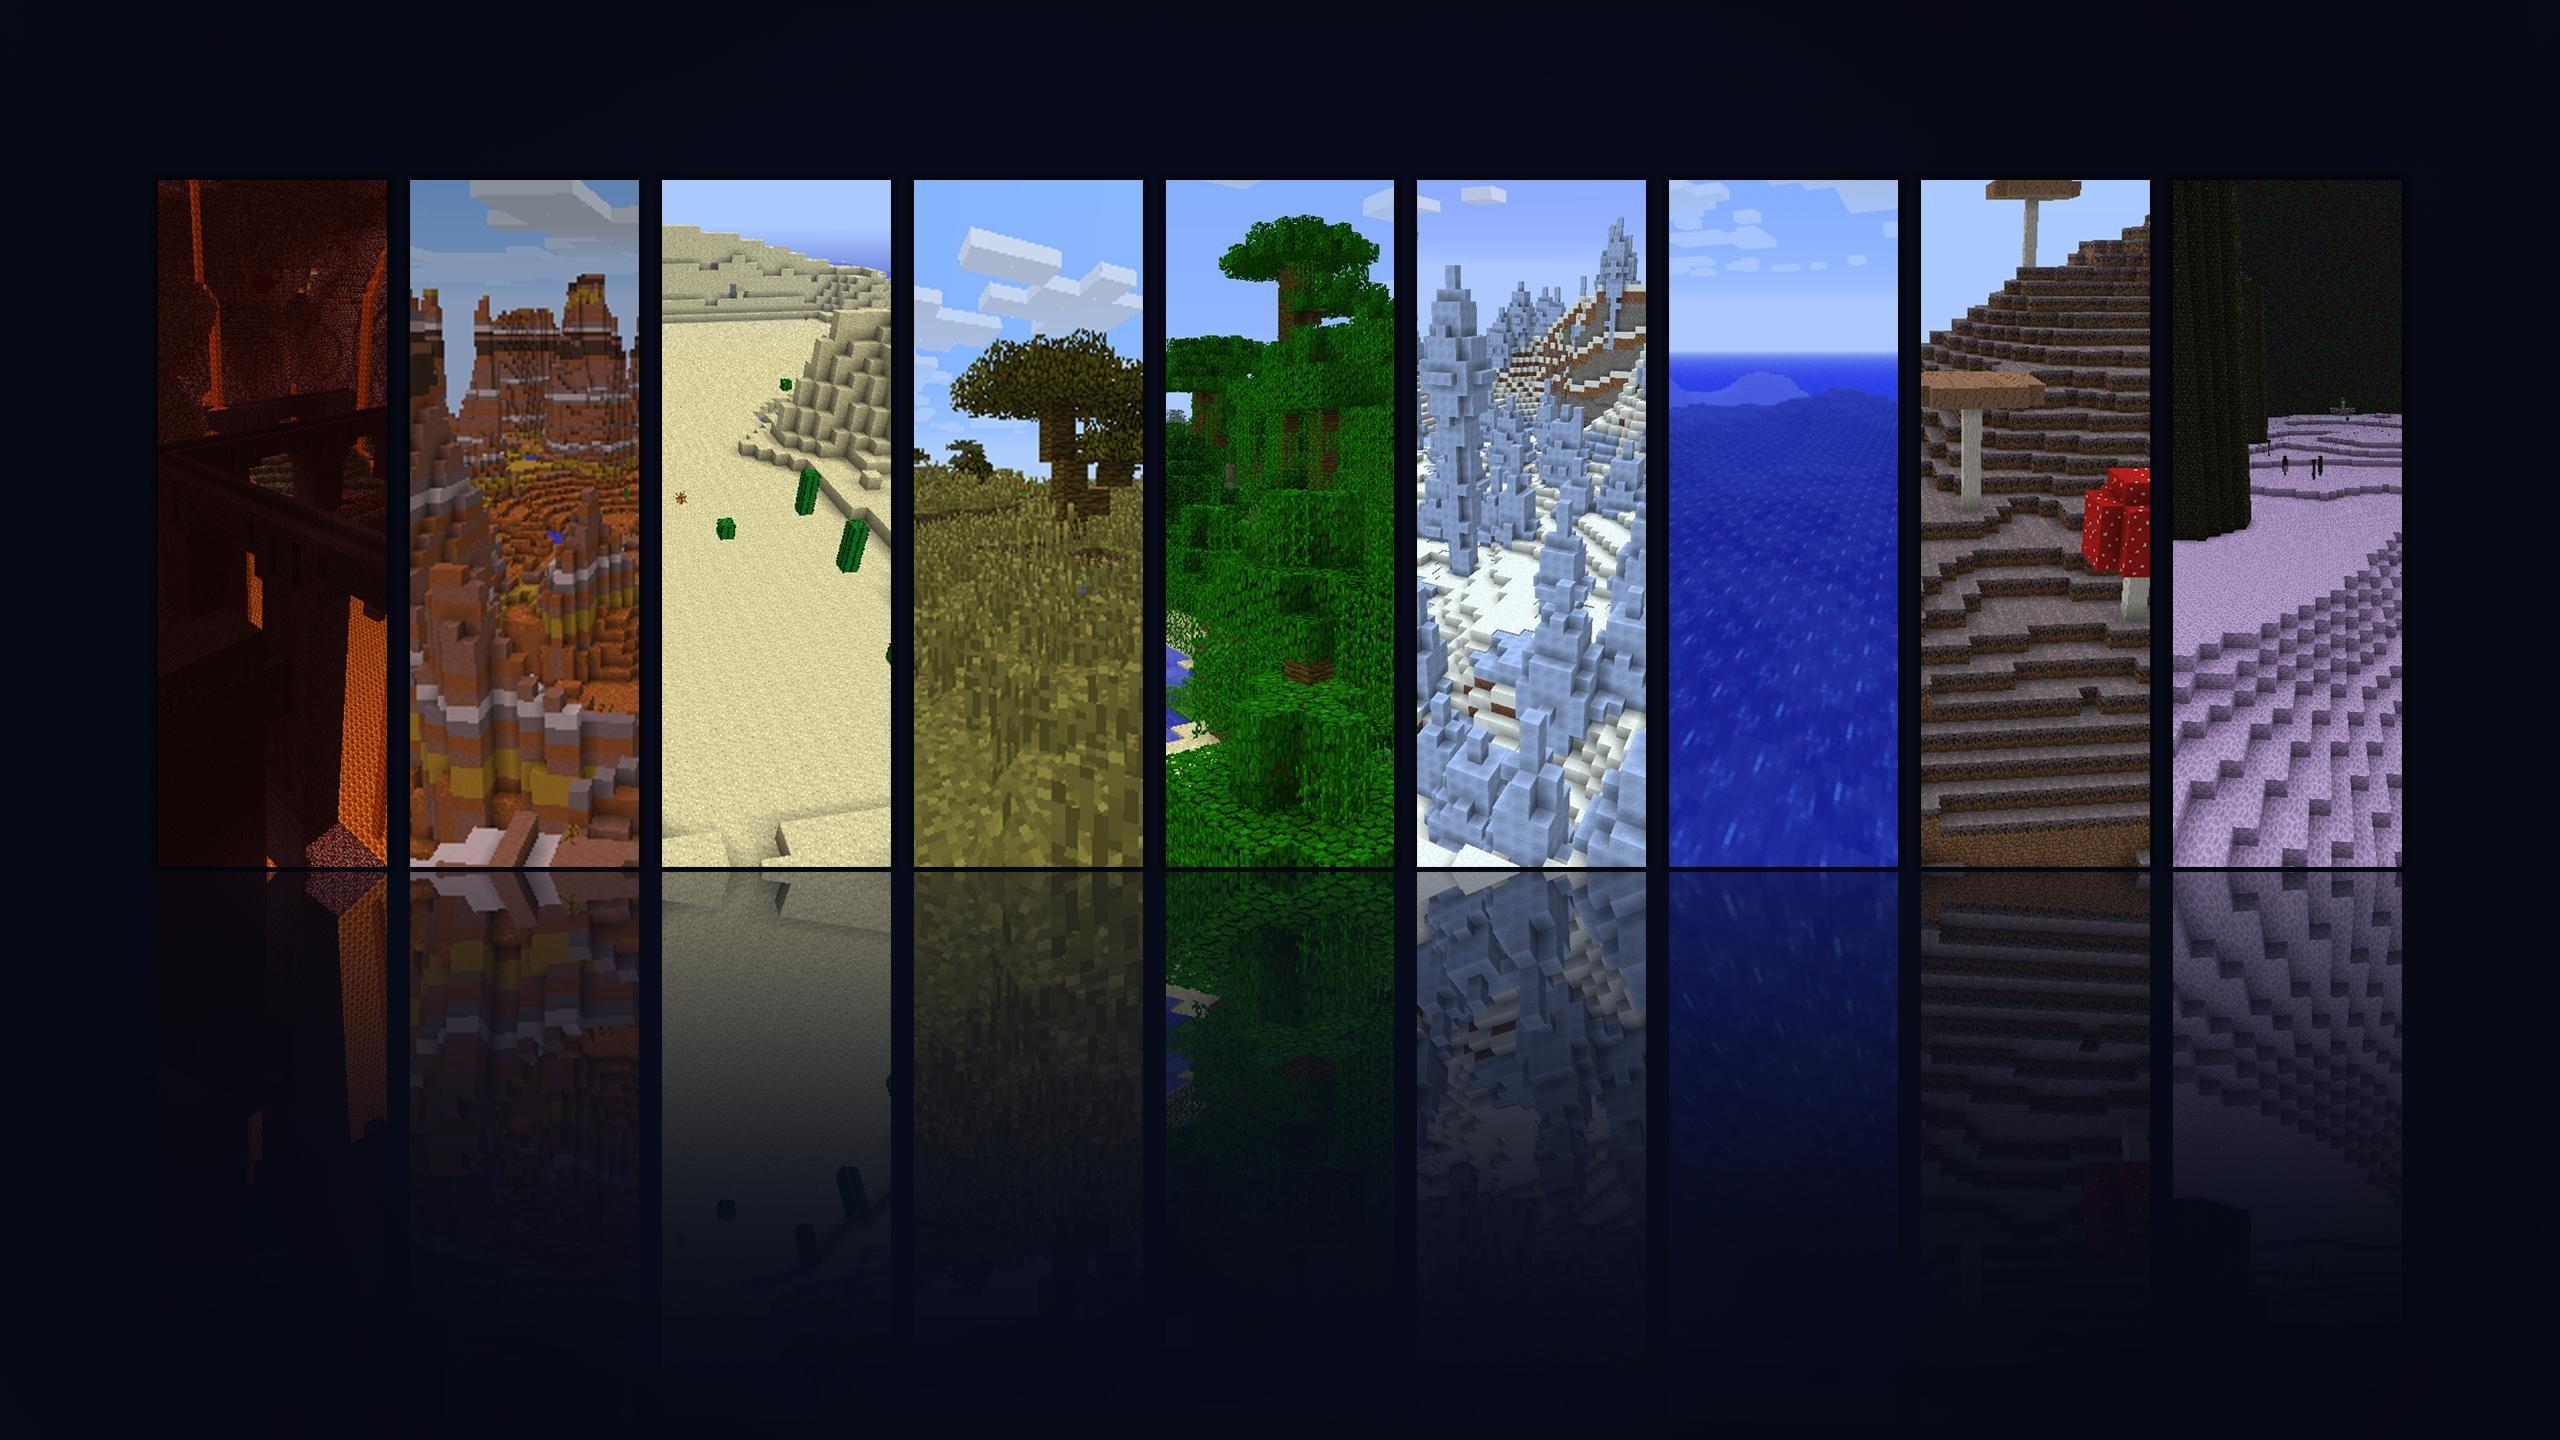 Amazing Wallpaper Minecraft Computer - 960404-new-minecraft-computer-wallpaper-2560x1440  Snapshot_401097.jpg